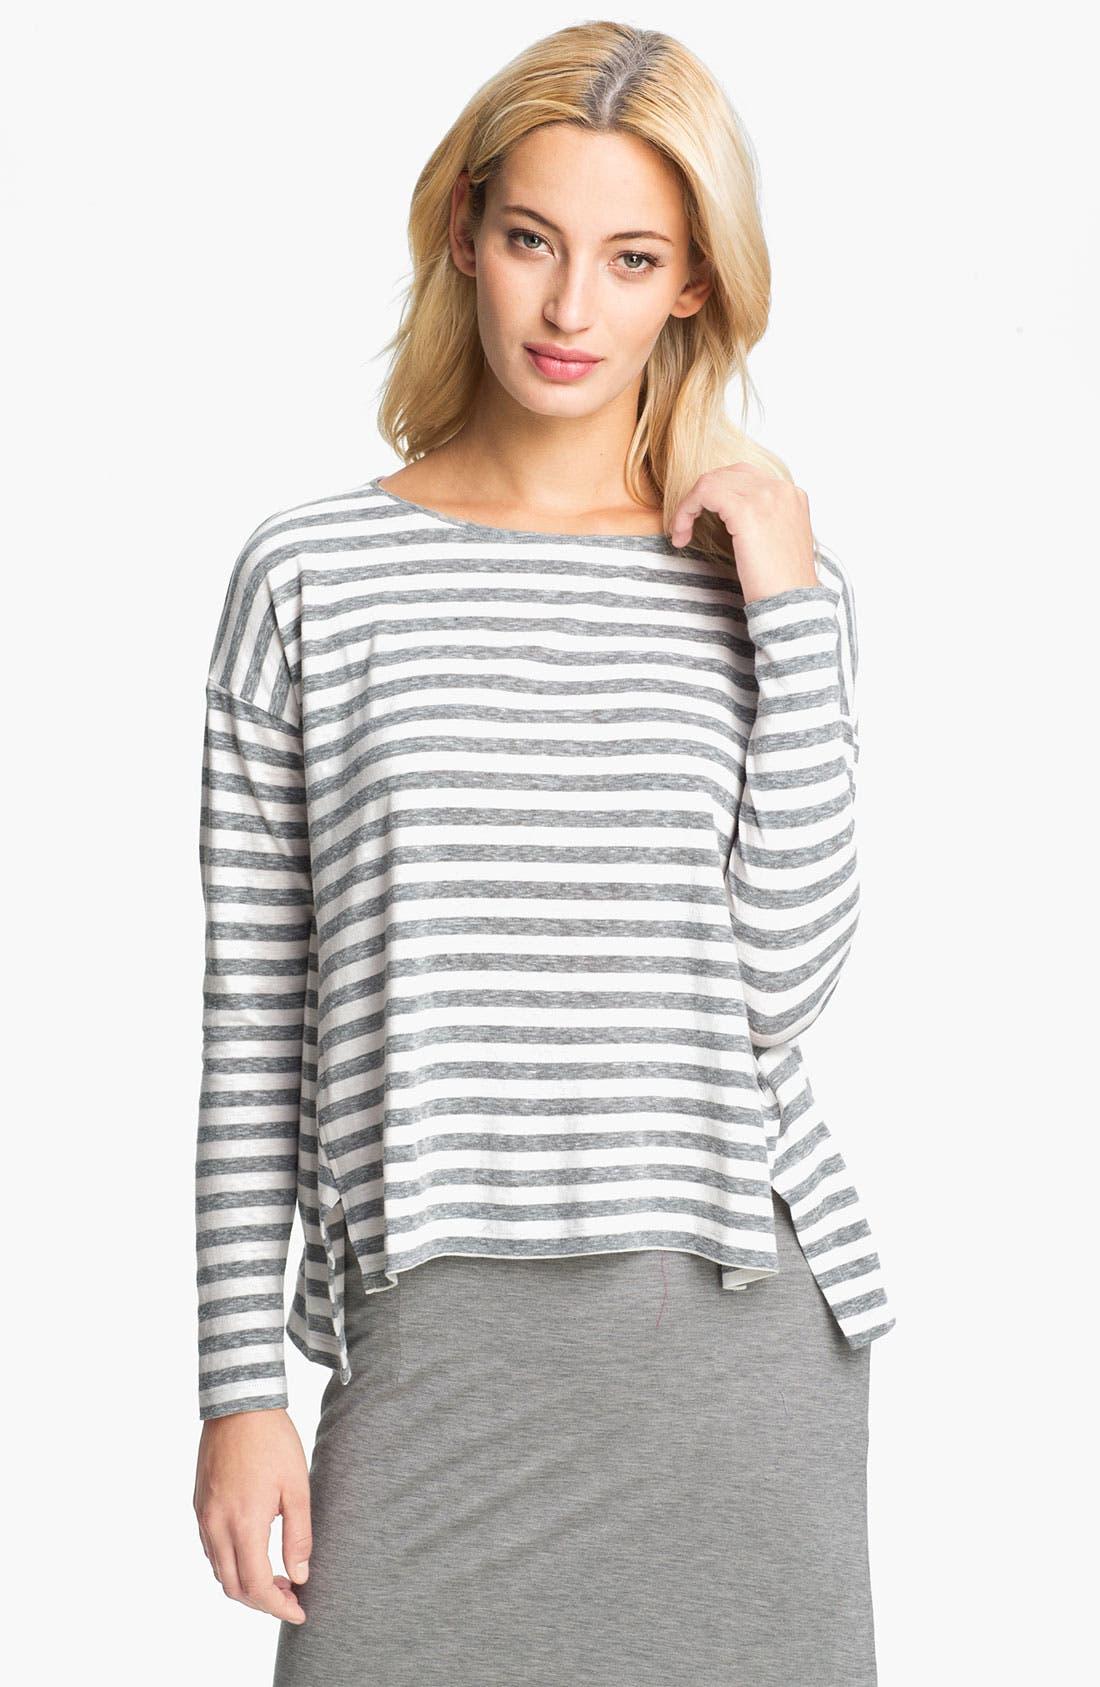 Alternate Image 1 Selected - Eileen Fisher Mélange Slub Stripe Top